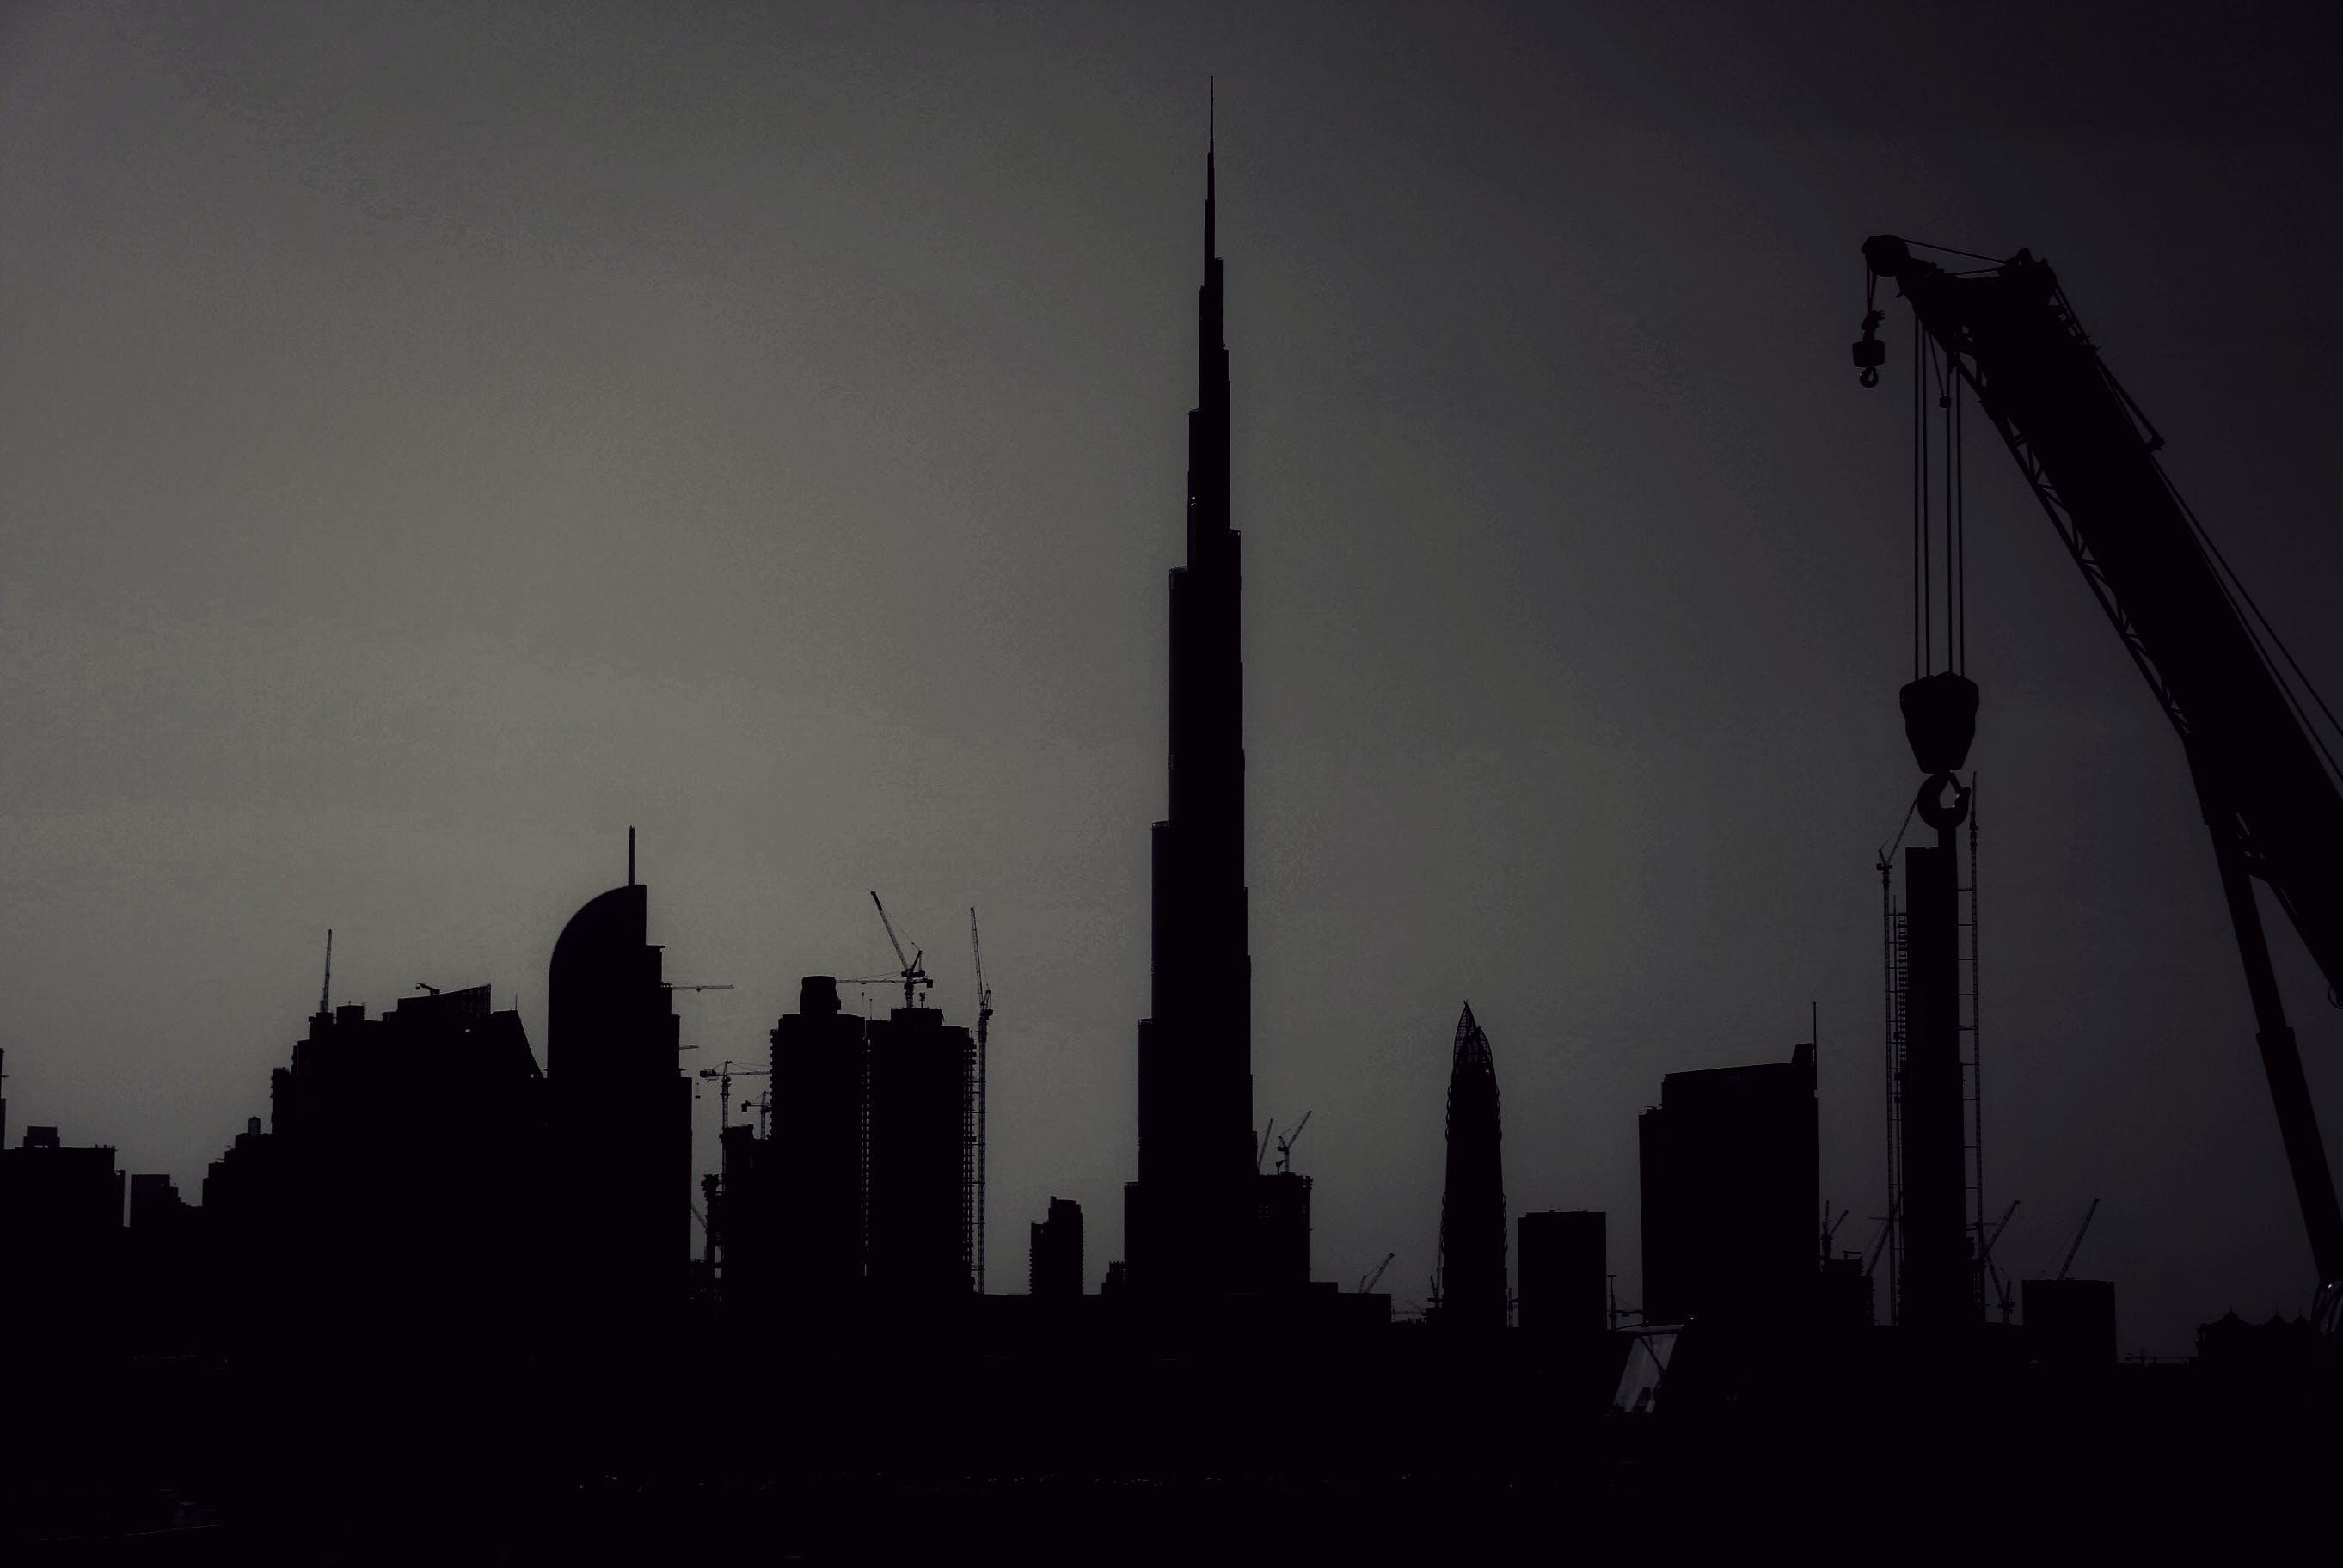 Free stock photo of building, buildings, burj khalifa, caterpillar